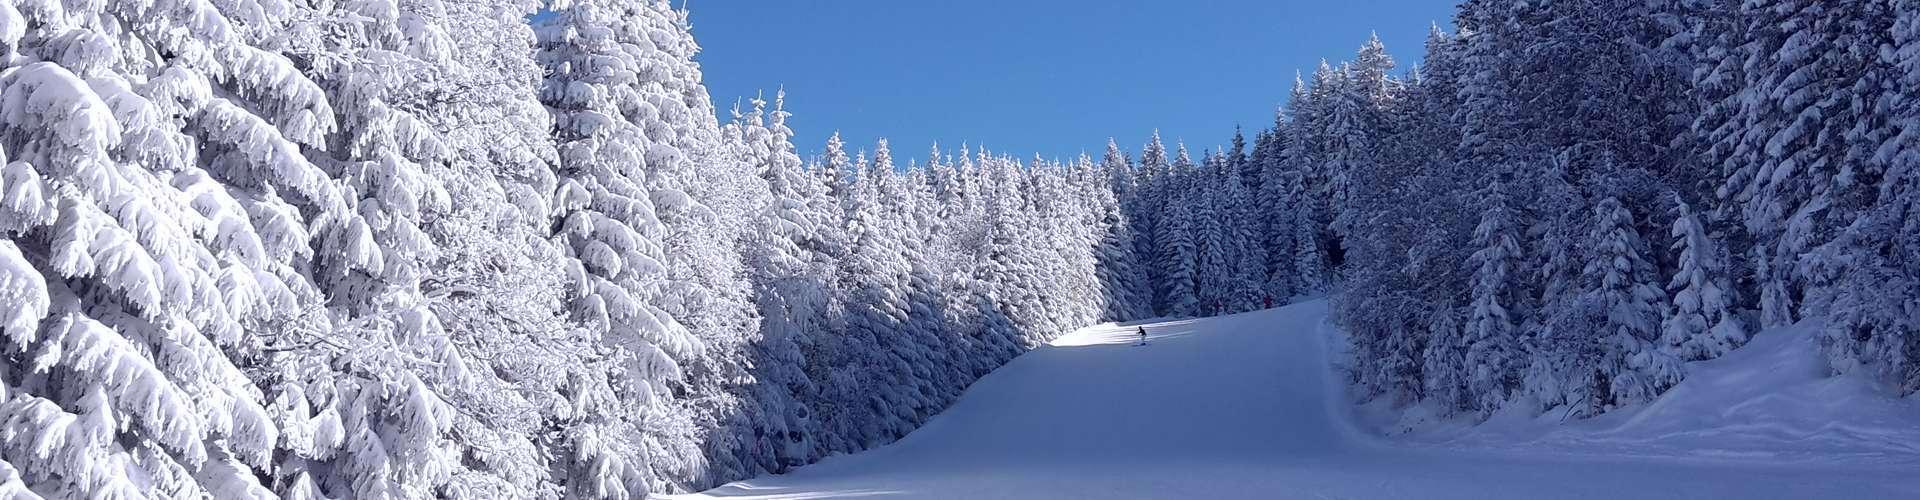 hotel-bergerhof-winterurlaub-montafon-3-s